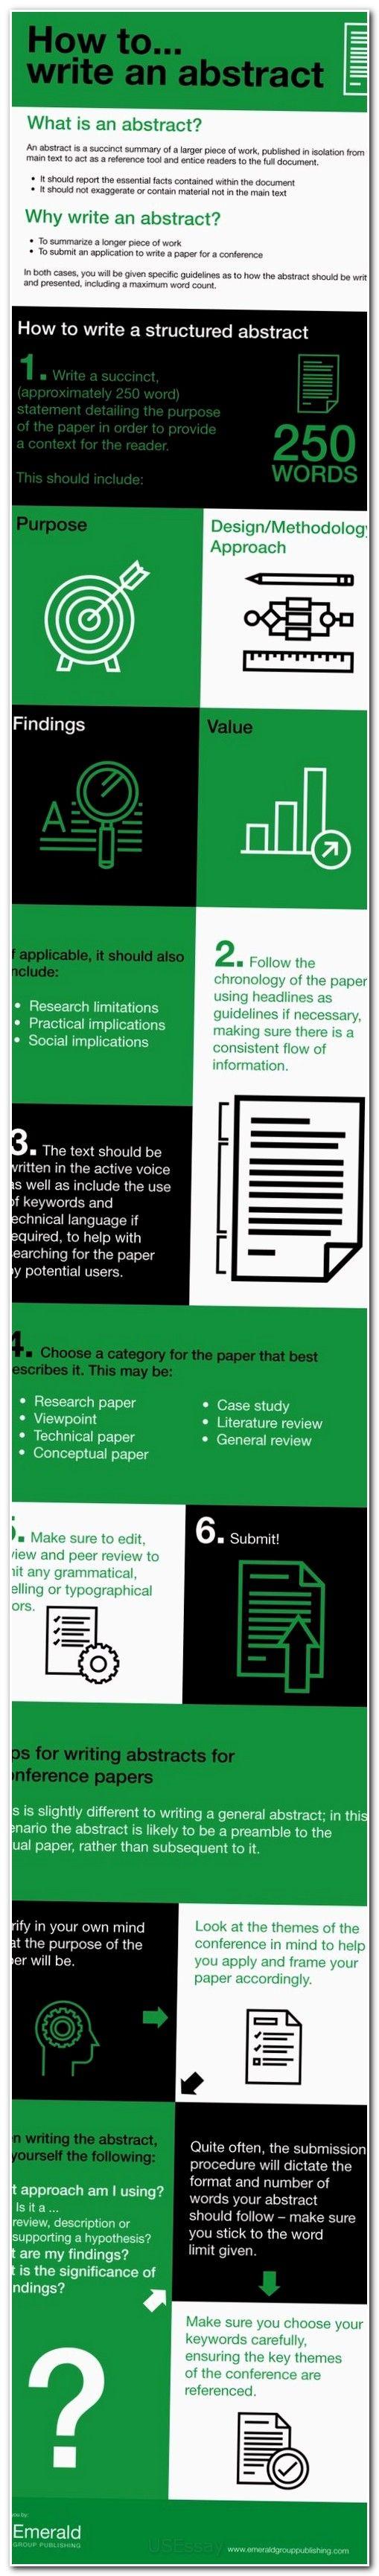 essay grammar checker free